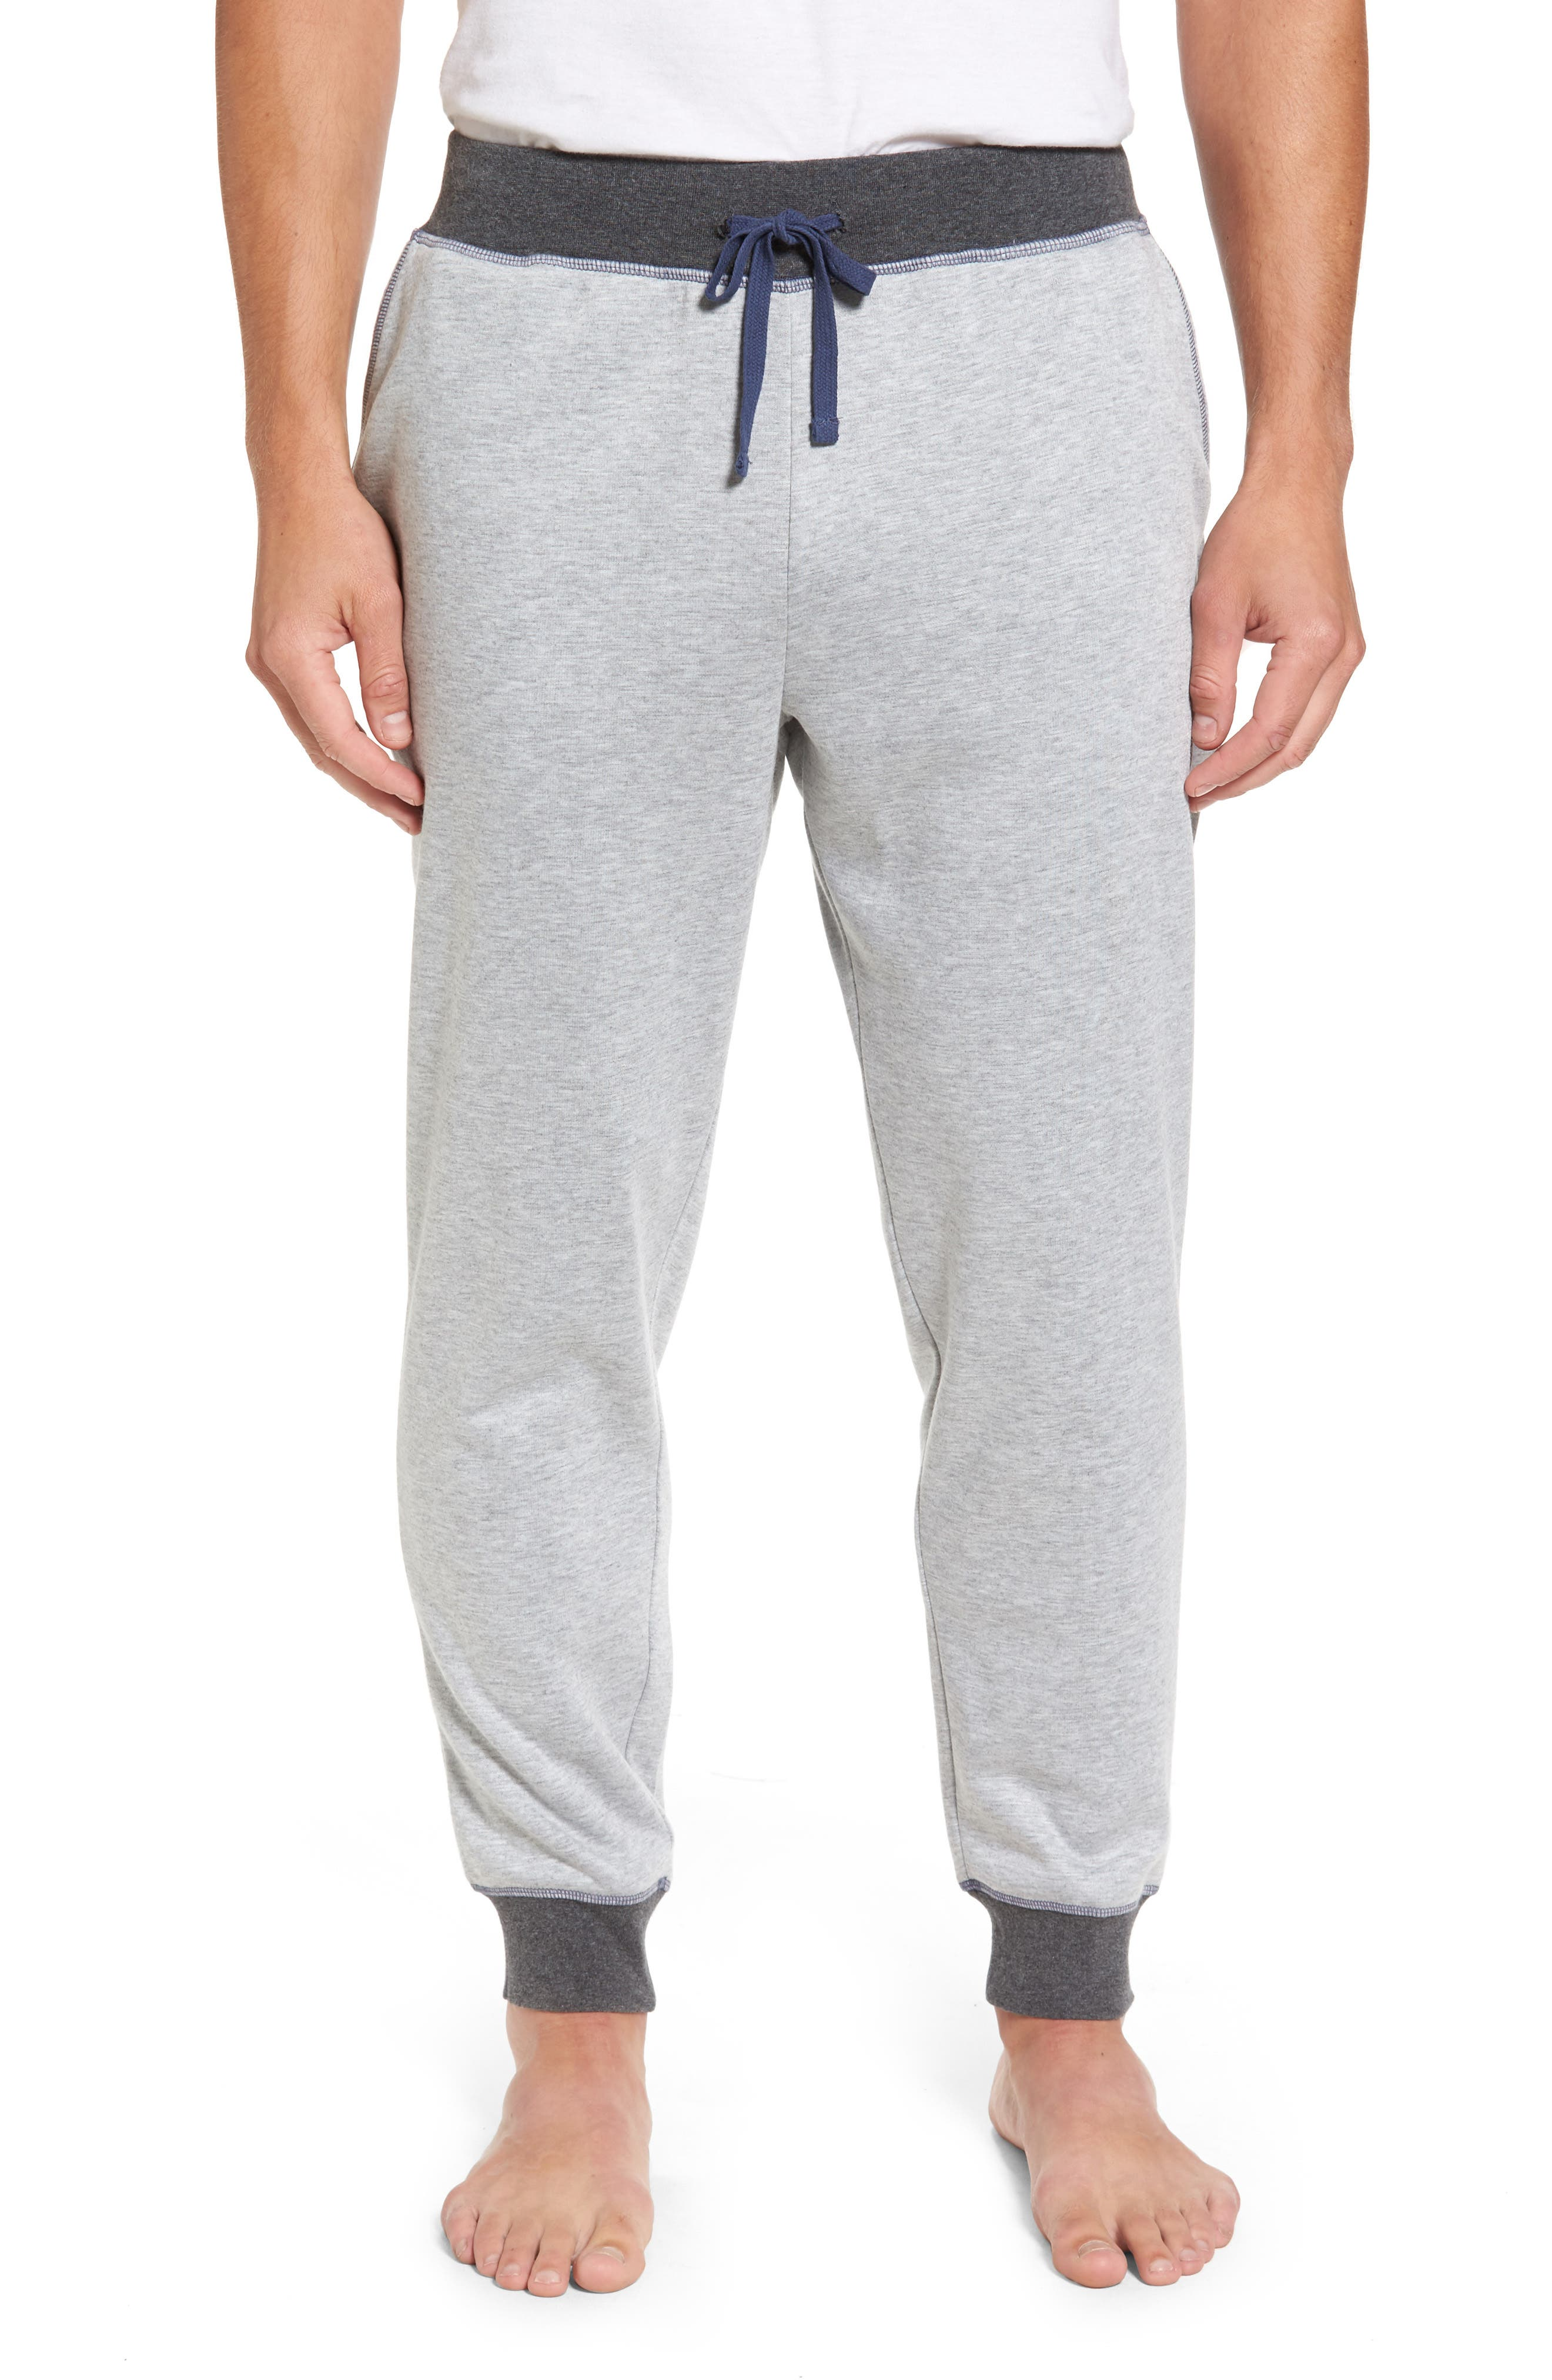 Double Take Knit Lounge Pants,                         Main,                         color, Grey